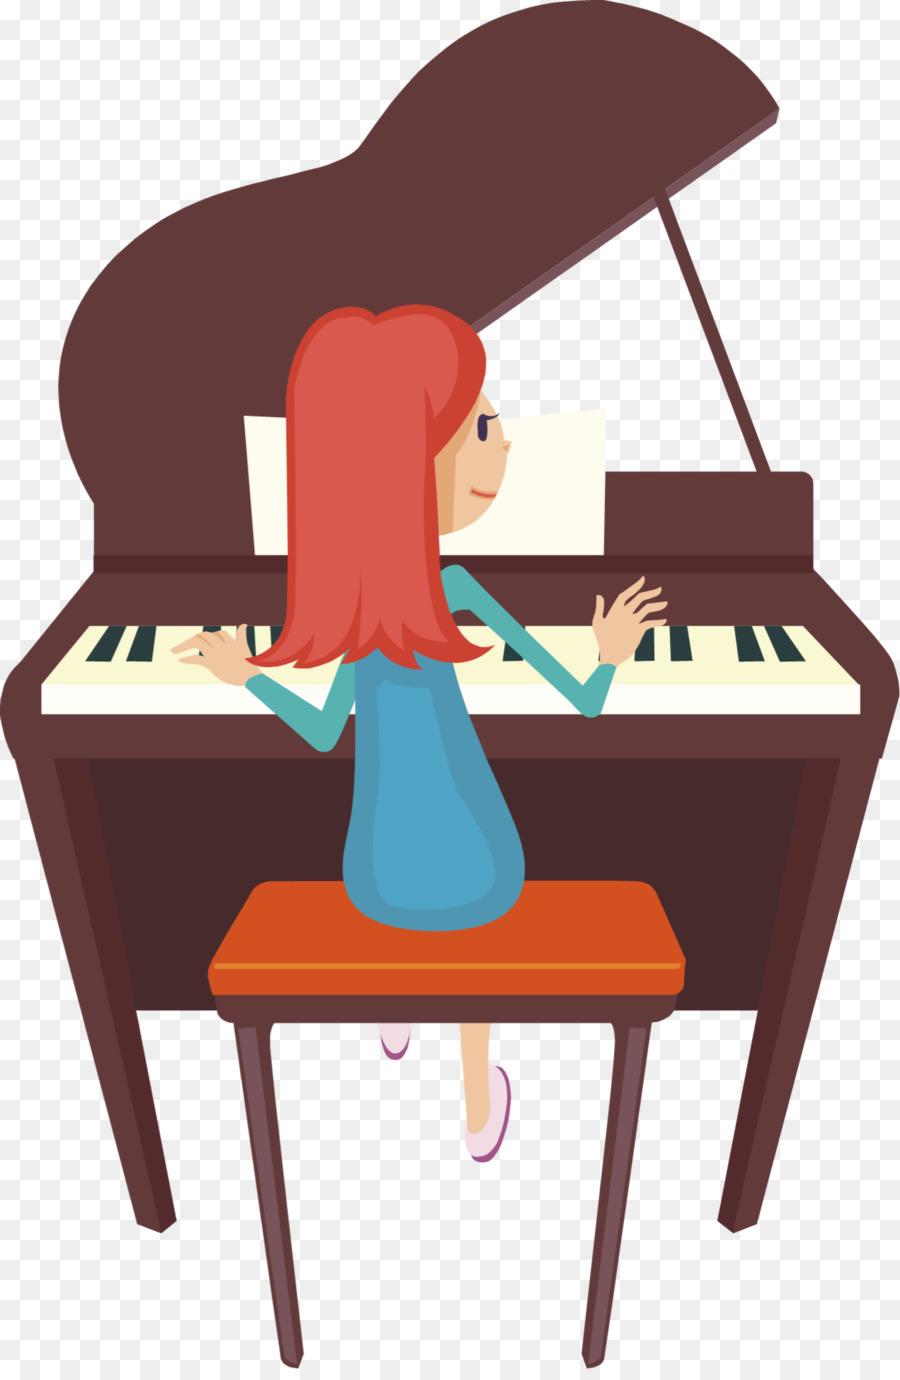 Player piano Pianist Clip art.